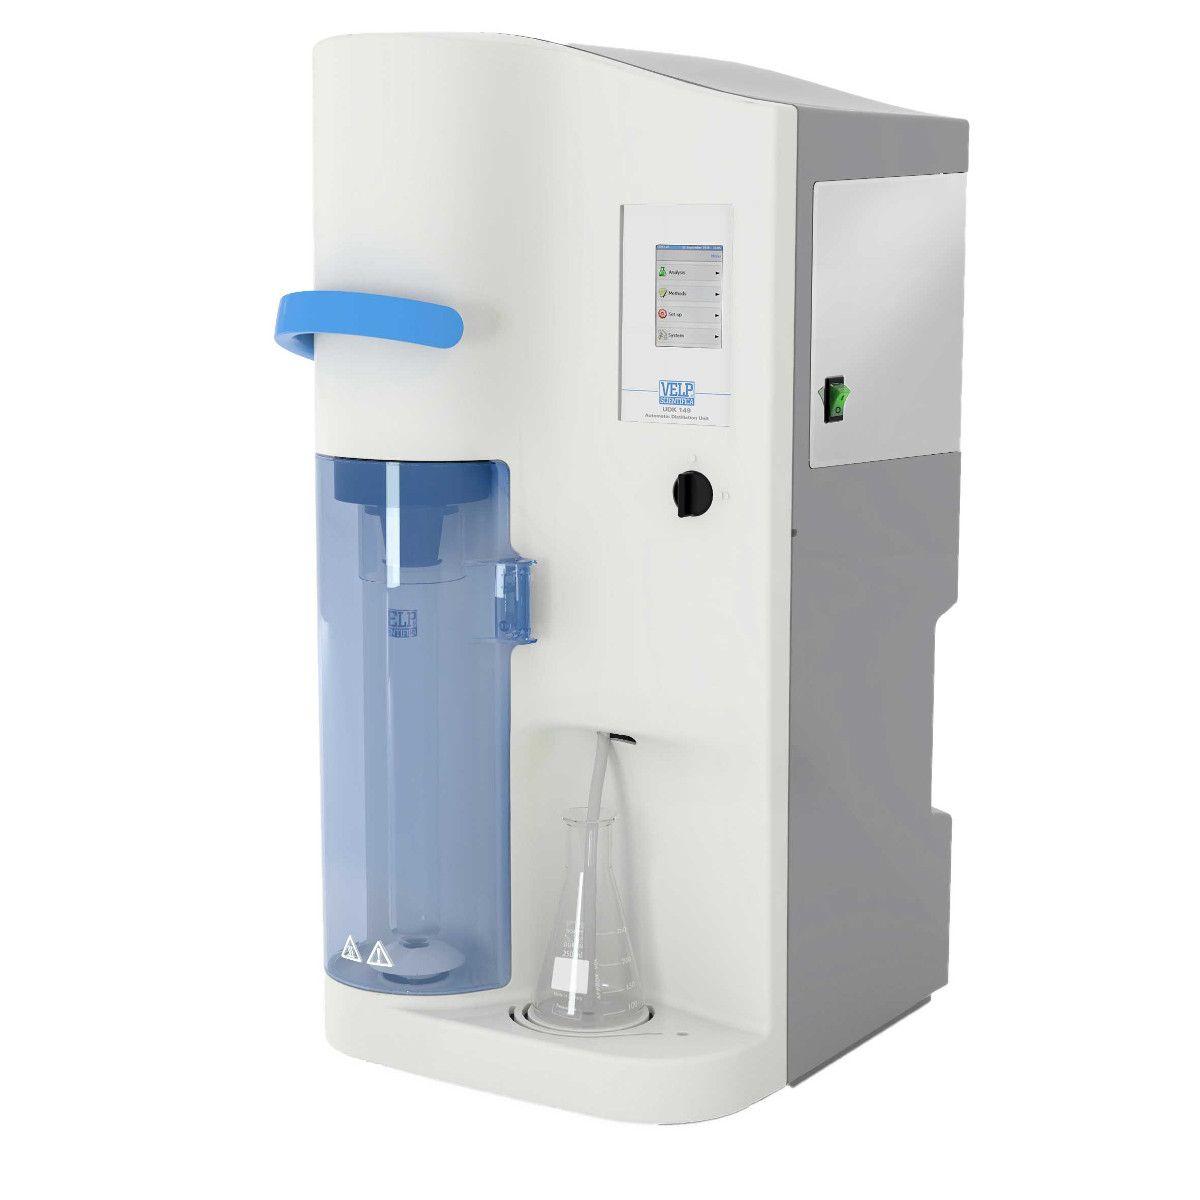 VELP Scientifica - UDK 149 Automatic Kjeldahl Distillation Unit